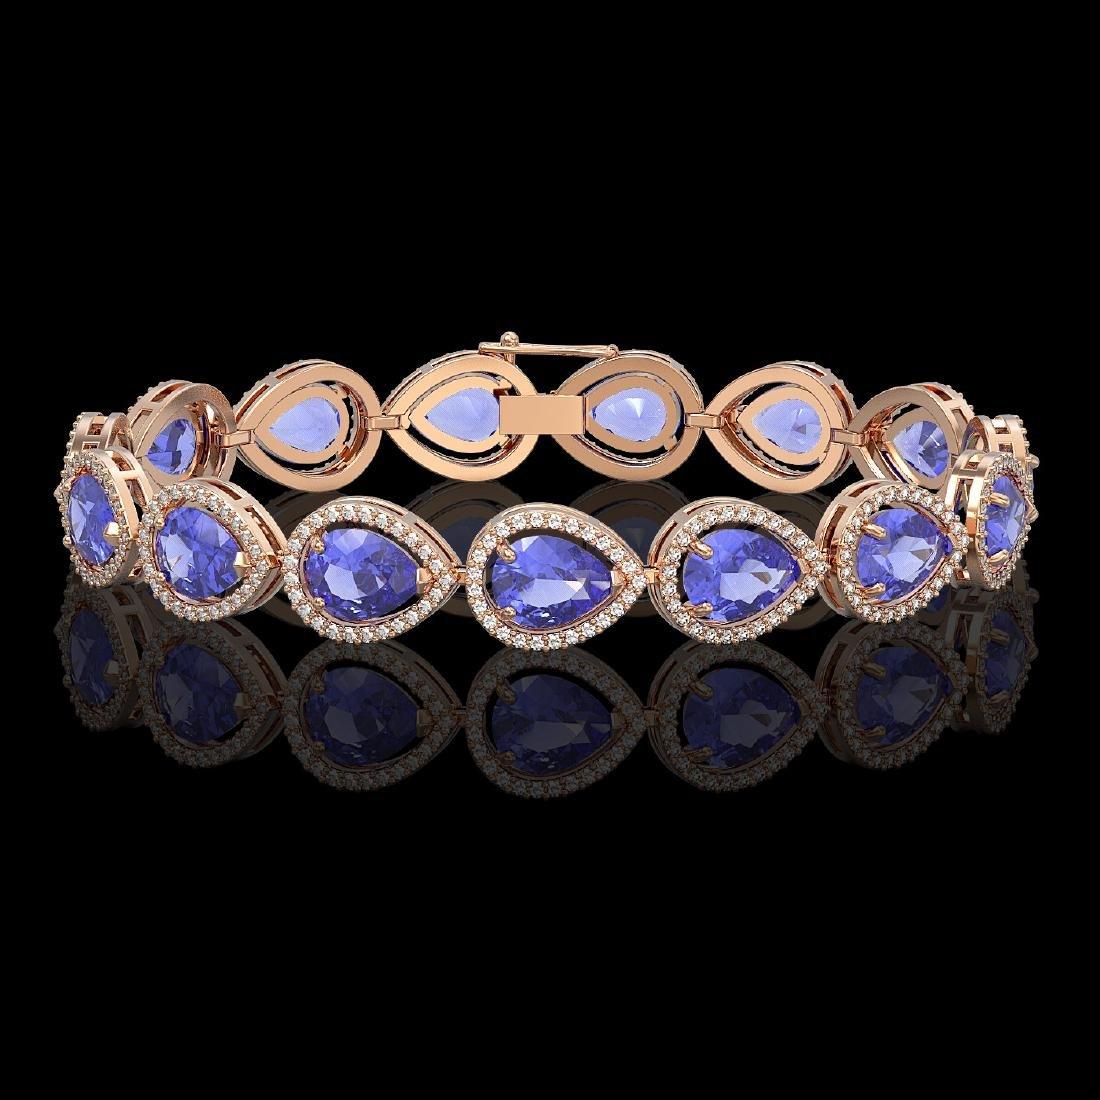 21.06 CTW Tanzanite & Diamond Halo Bracelet 10K Rose